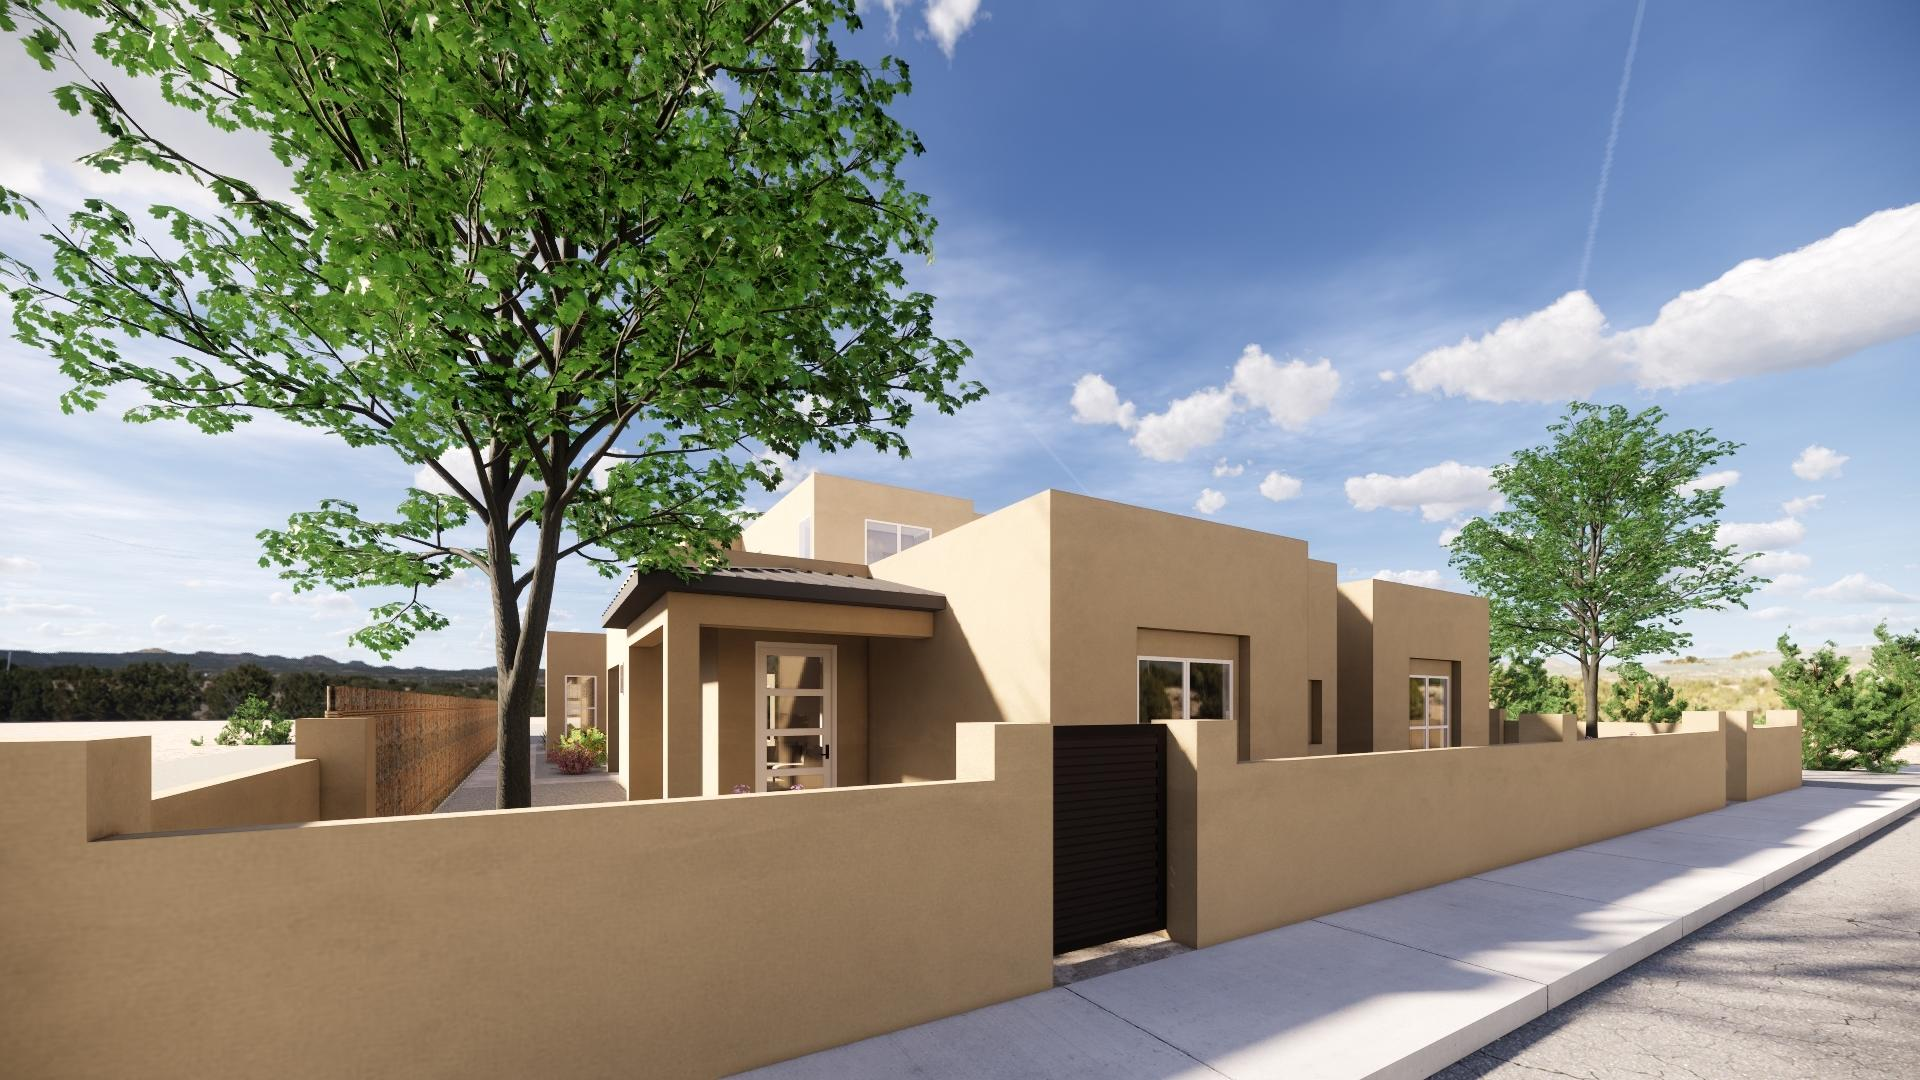 42 BLUE FEATHER Road, Santa Fe, NM 87508 - Santa Fe, NM real estate listing